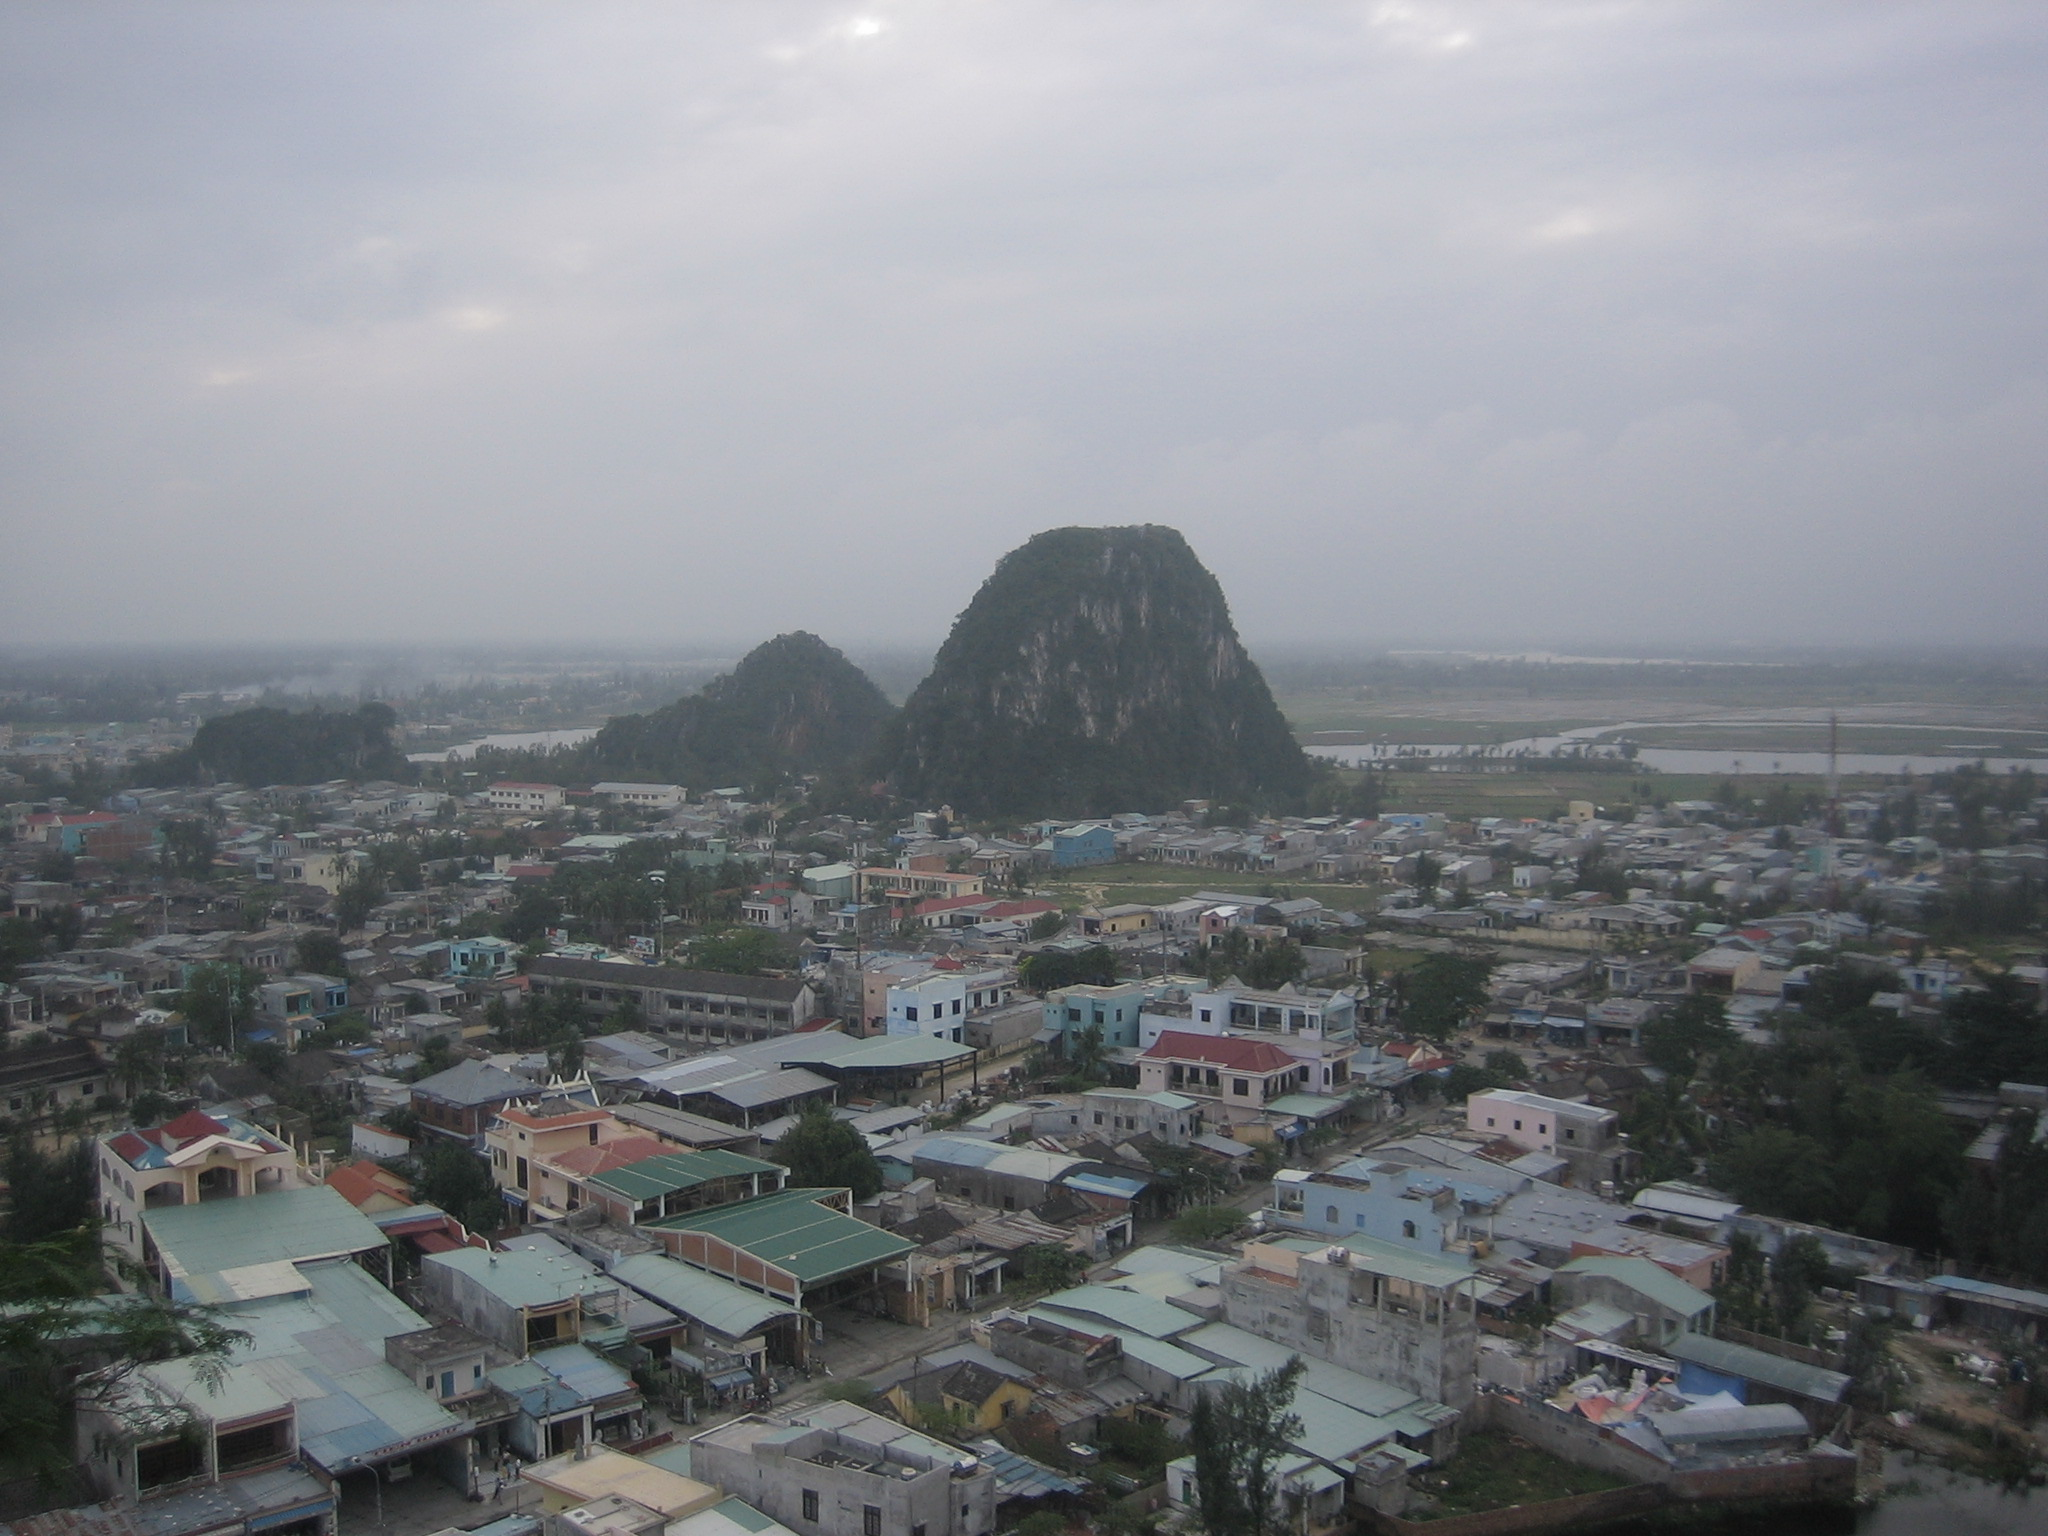 Da Nang Vietnam  city images : Description Marble Mountains, Da Nang, Vietnam 20071217